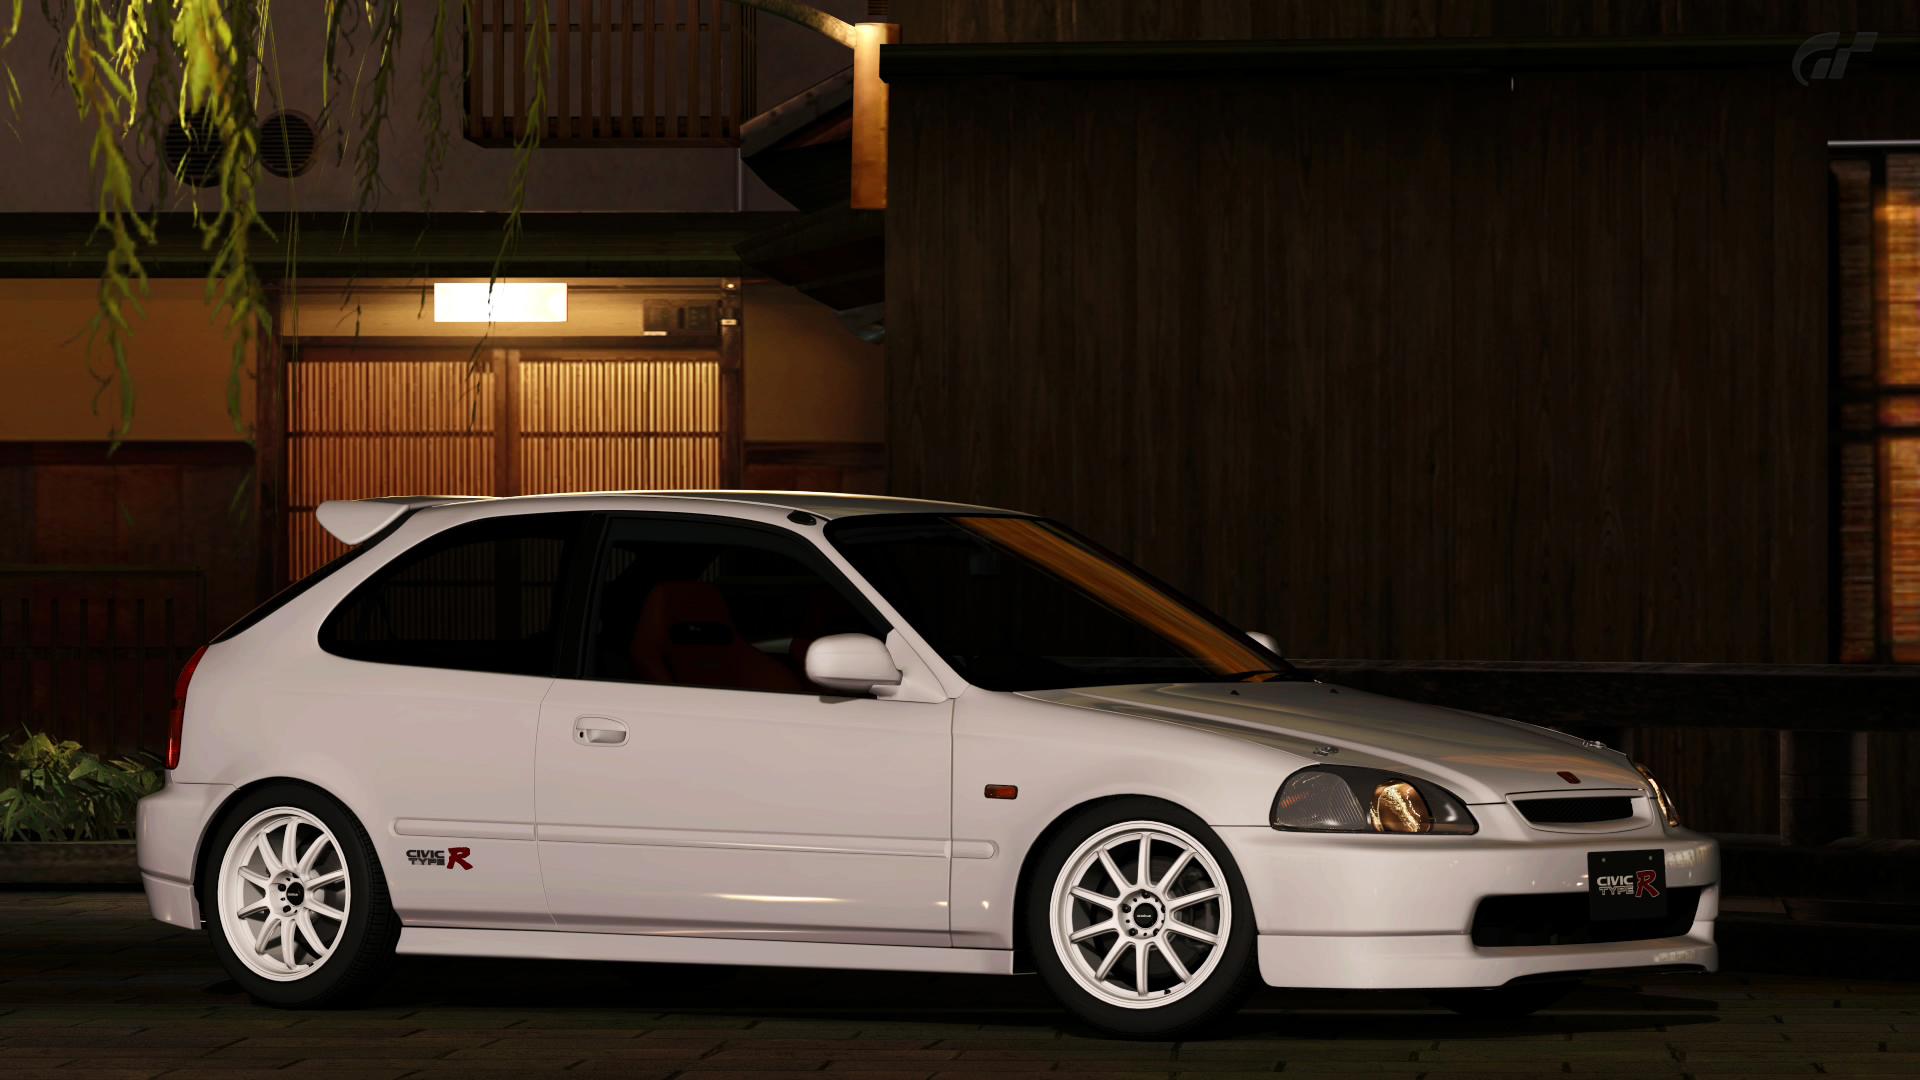 1997 Honda Civic Type-R (Gran Turismo 5) by Vertualissimo ...